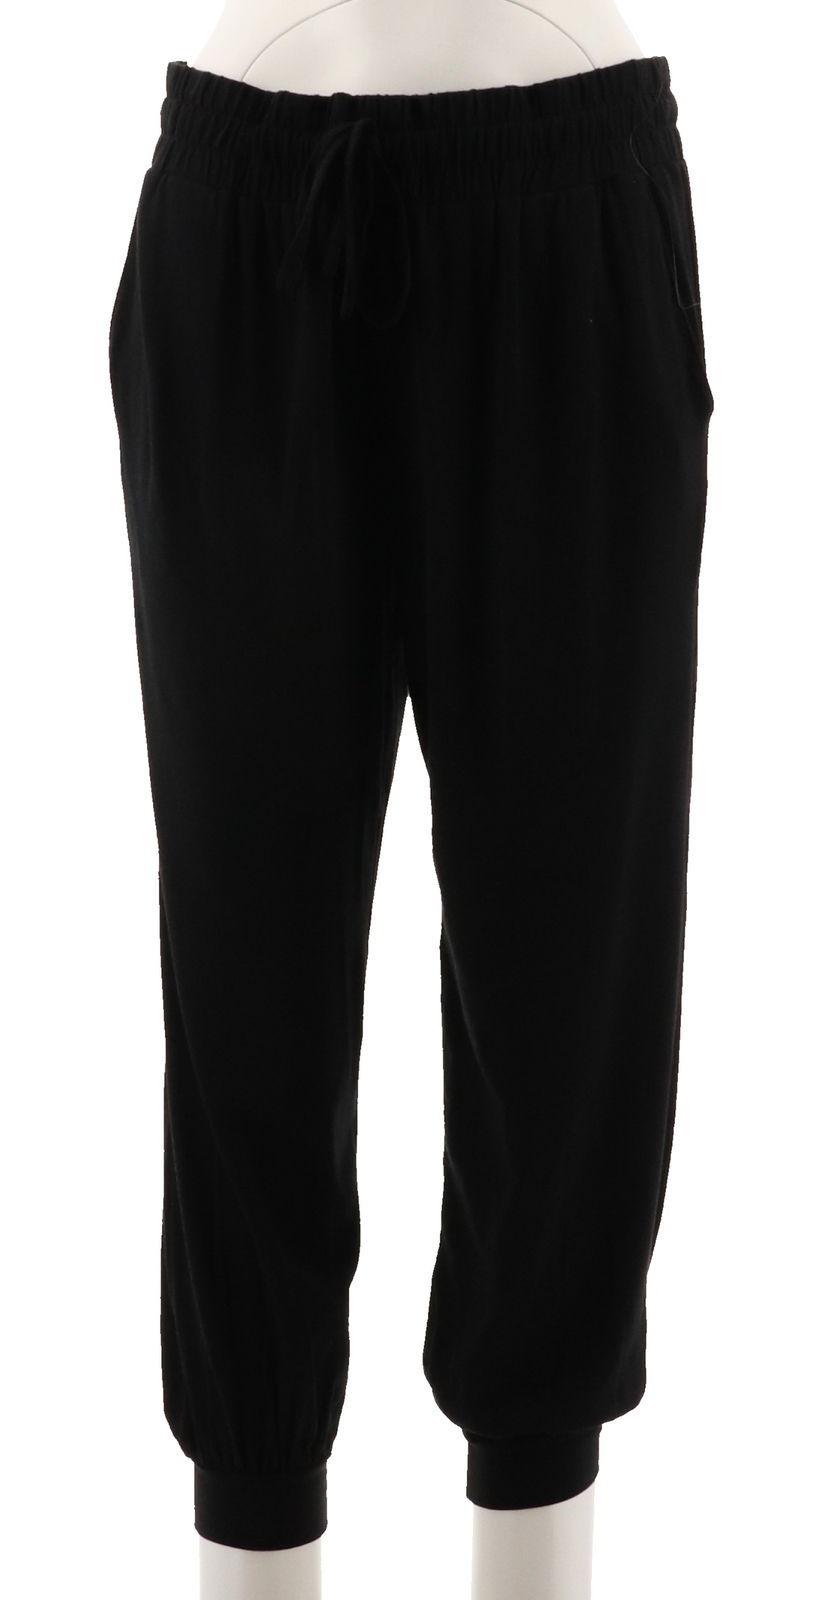 AnyBody Loungewear Cozy Knit Slim Pant Black S NEW A307835